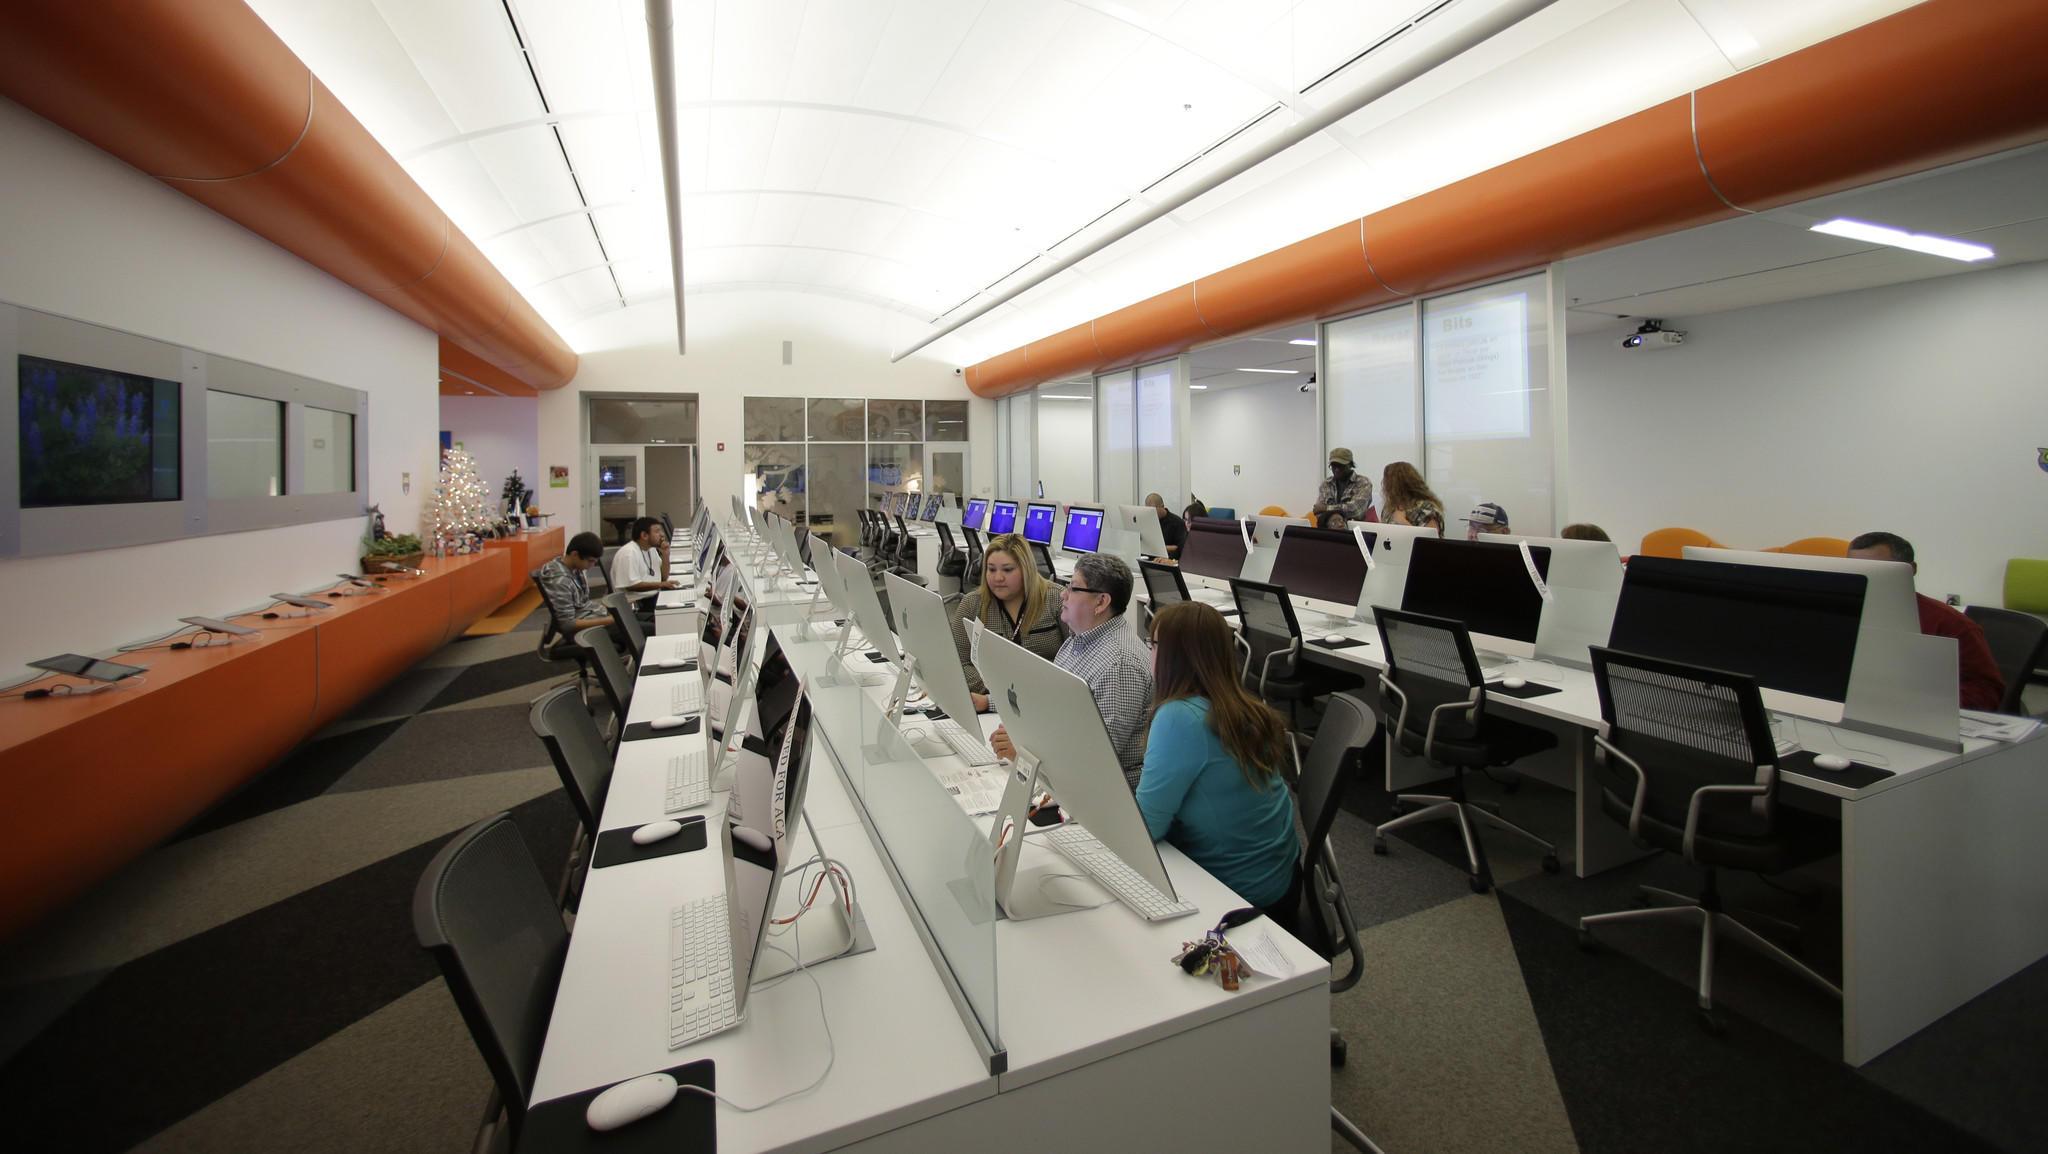 Patrons use computers at BiblioTech, a digital public library in San Antonio, Texas.